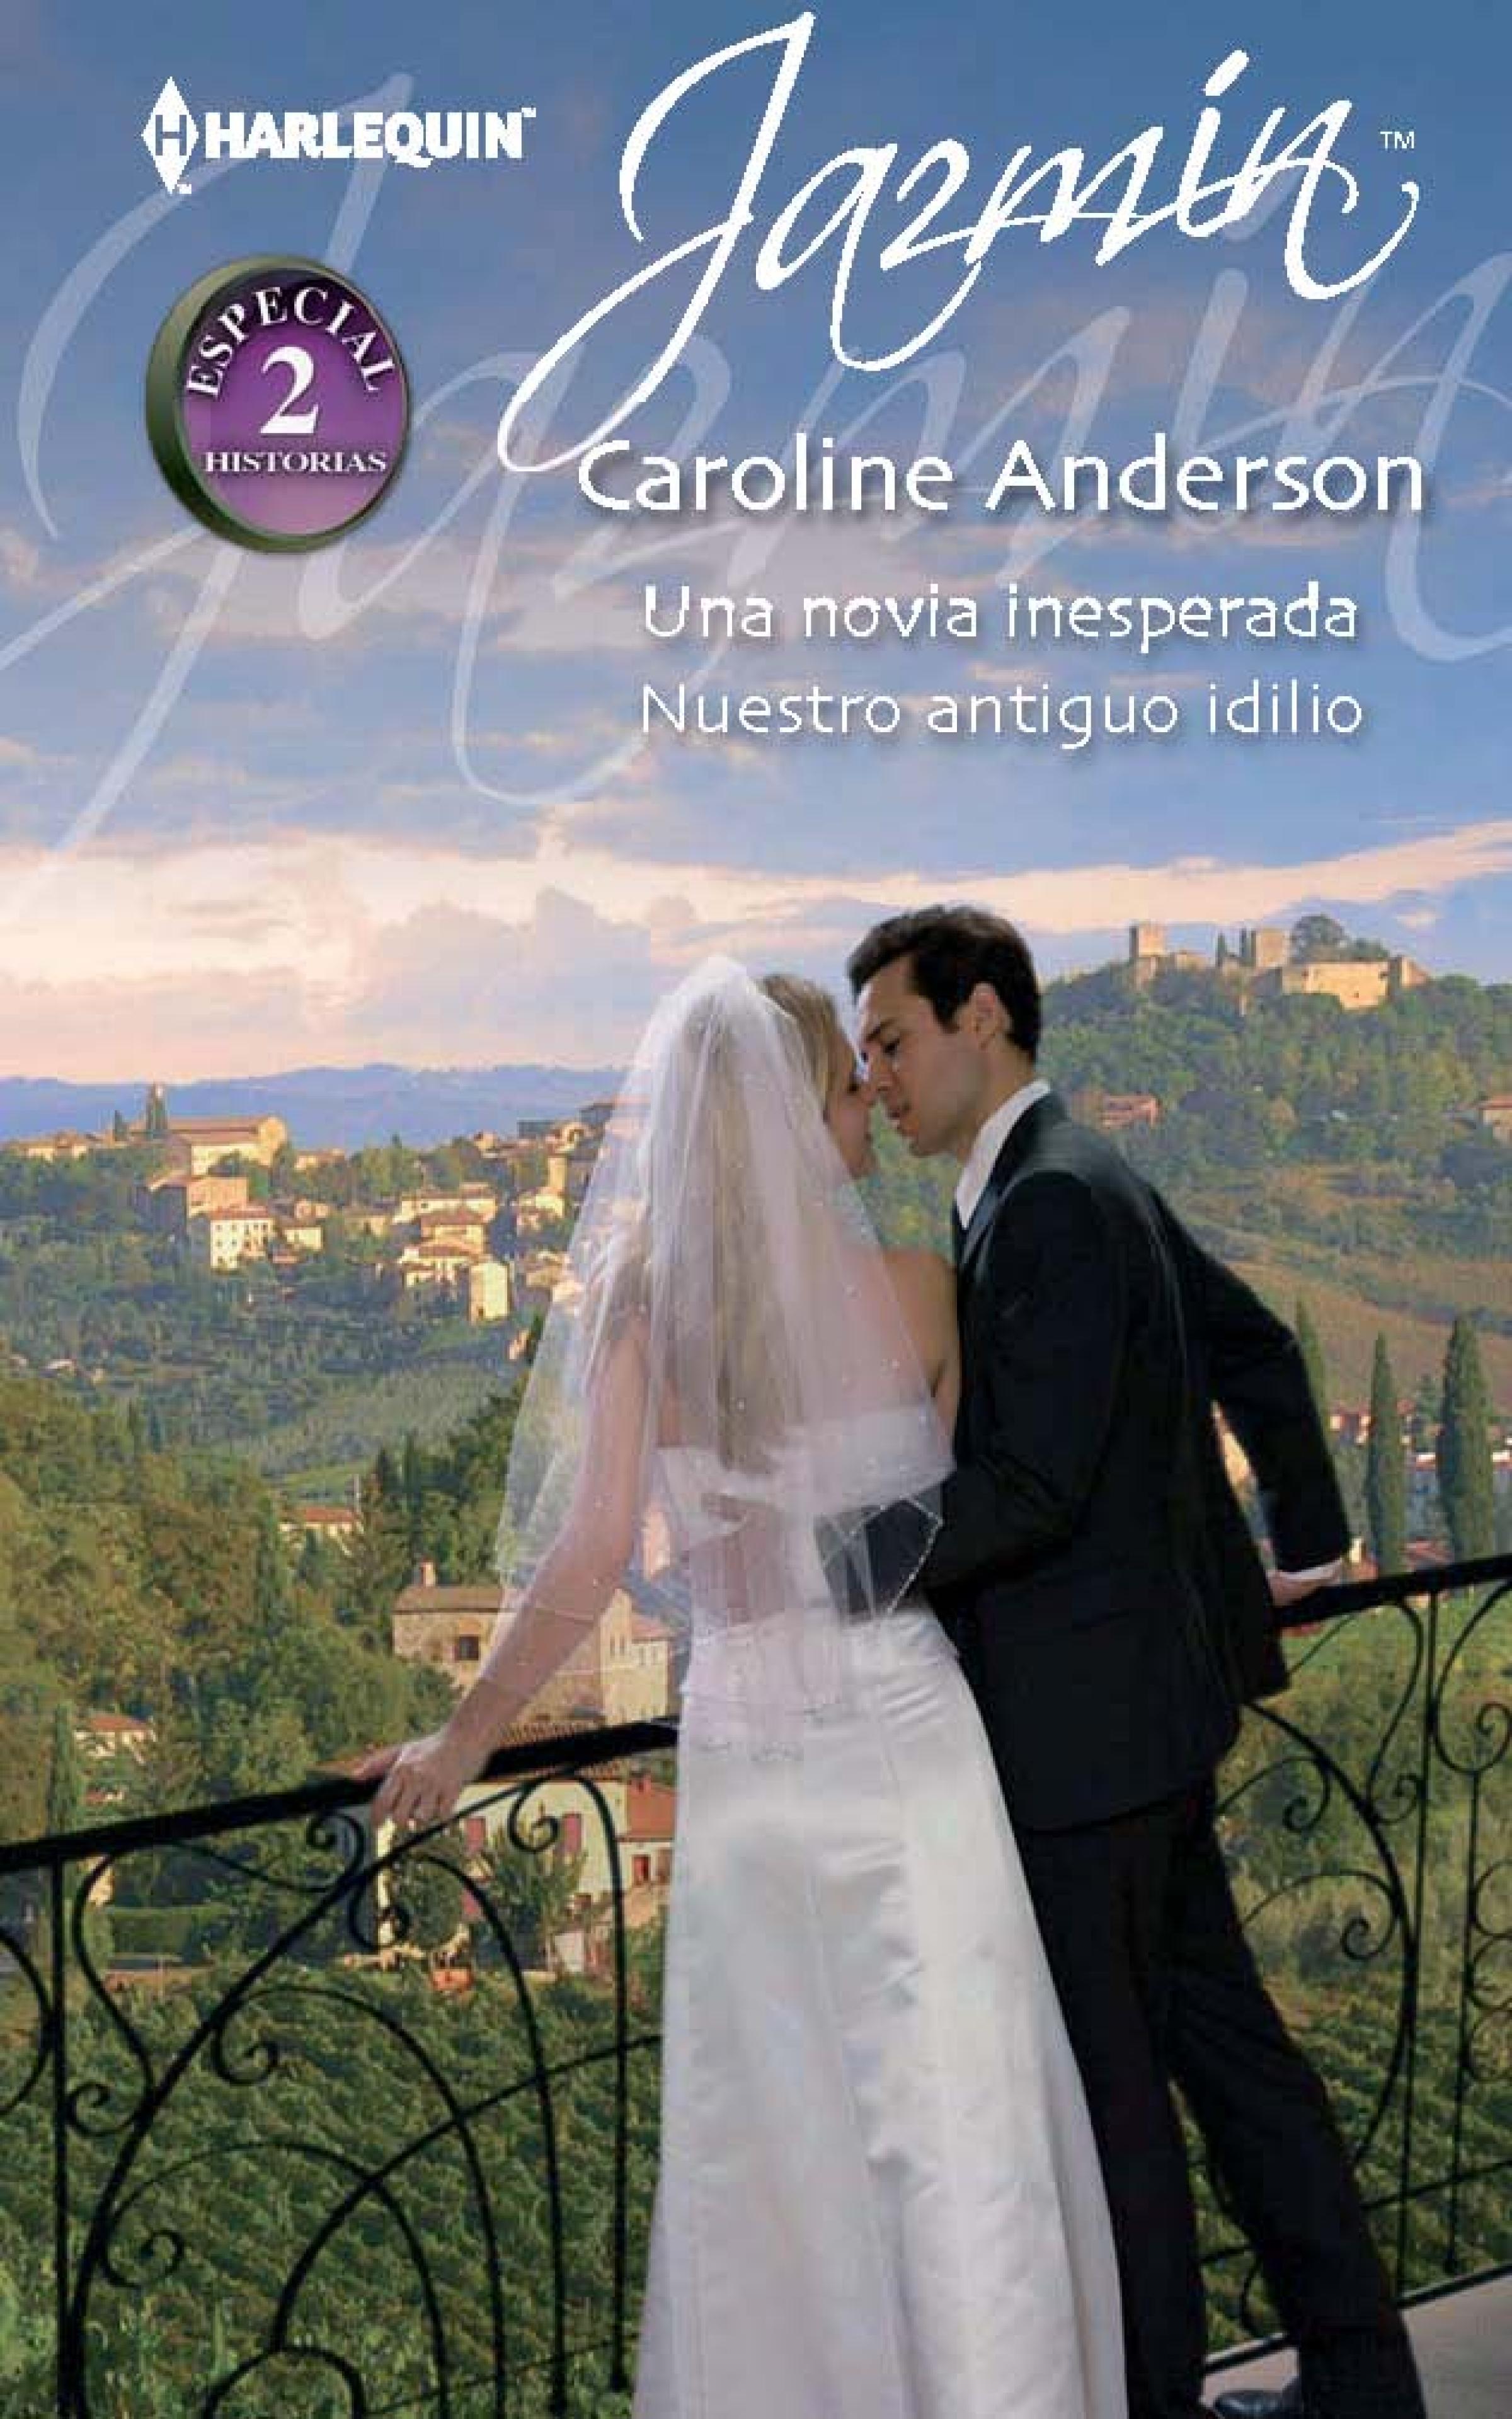 Caroline Anderson Una novia inesperada - Nuestro antiguo idilio sophie weston una pareja inesperada